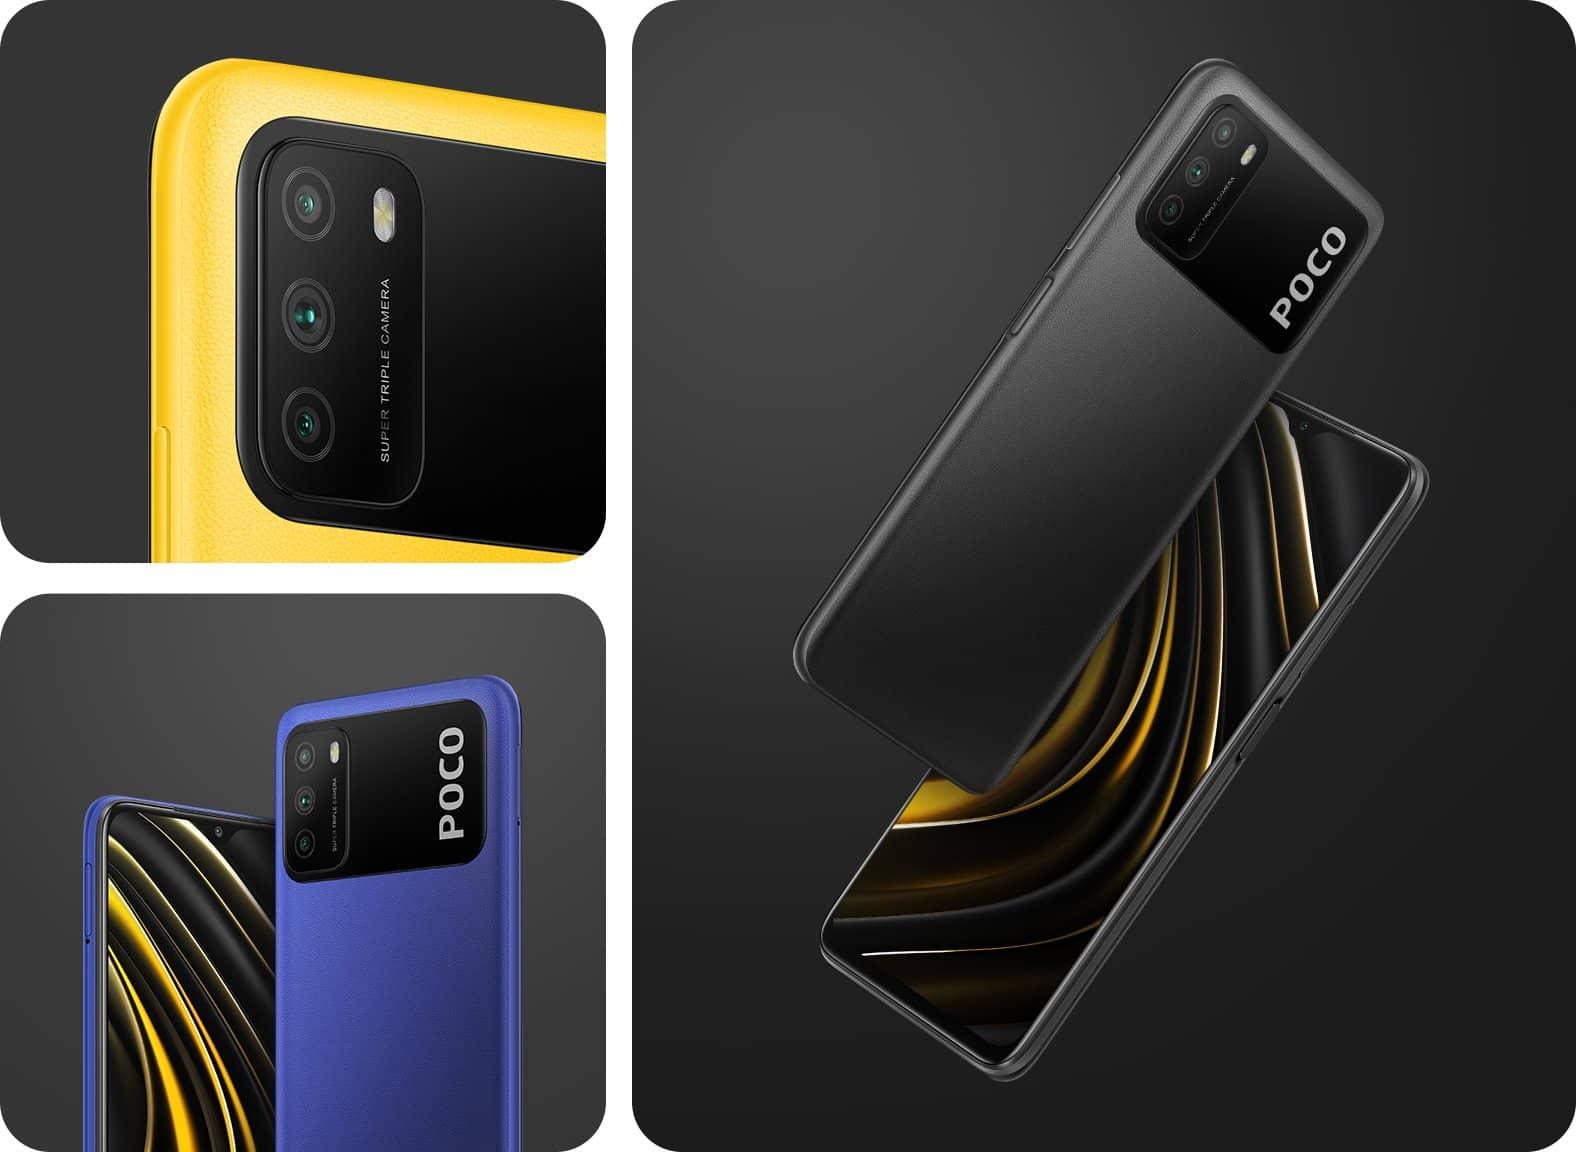 Xiaomi POCO M3 дизайн и цвета